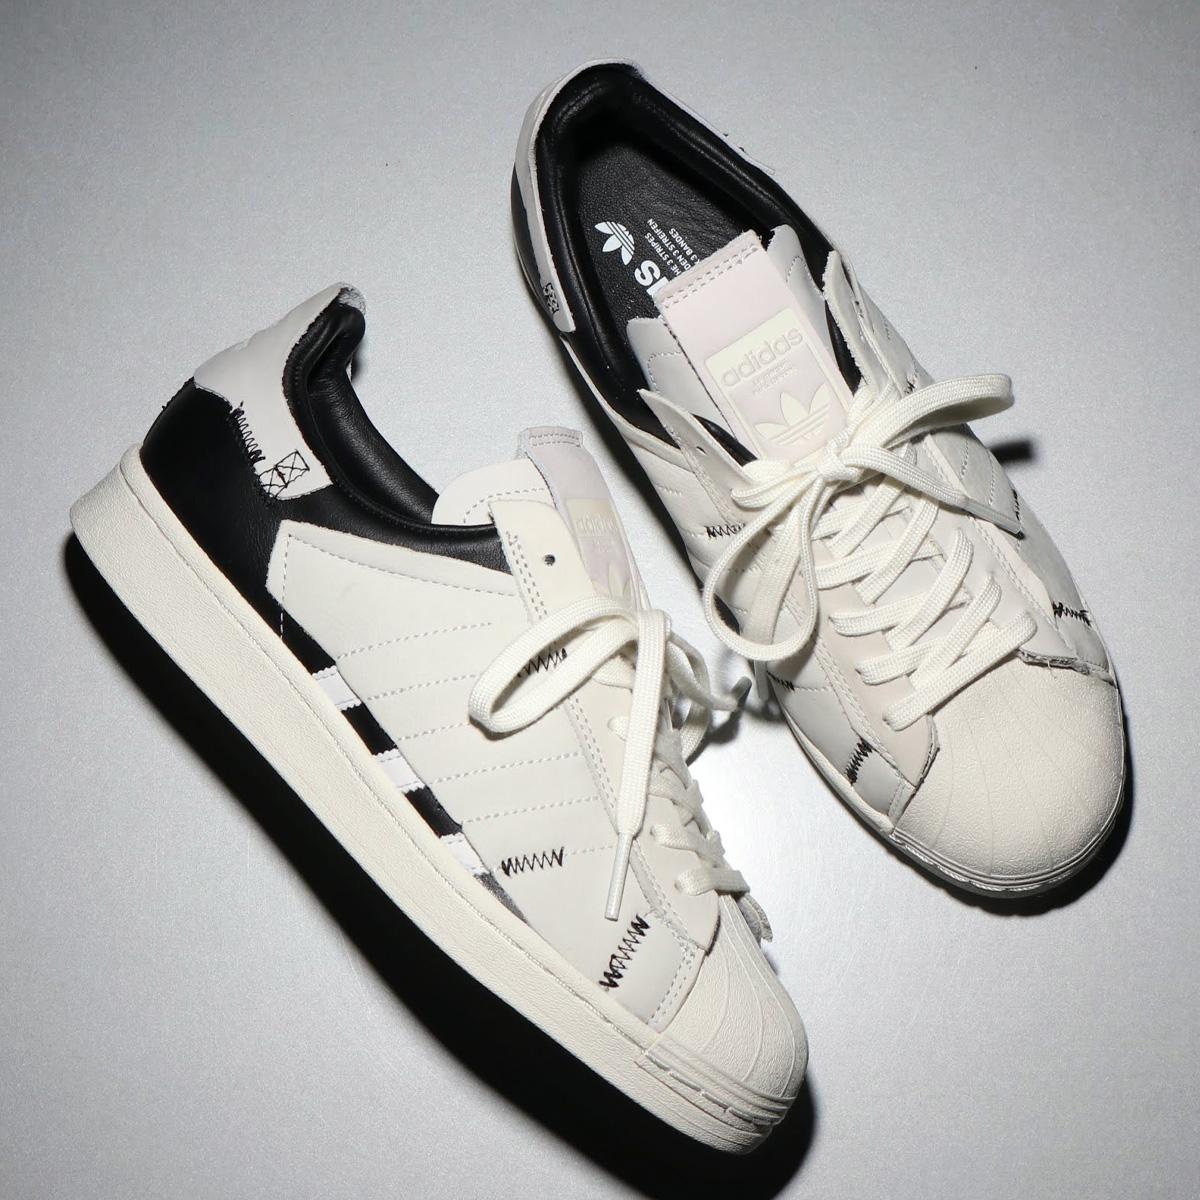 adidas SUPERSTAR(アディダス スーパースター)FOOTWEAR WHITE/CORE BLACK/OFF WHITE【メンズ レディース スニーカー】20SS-I